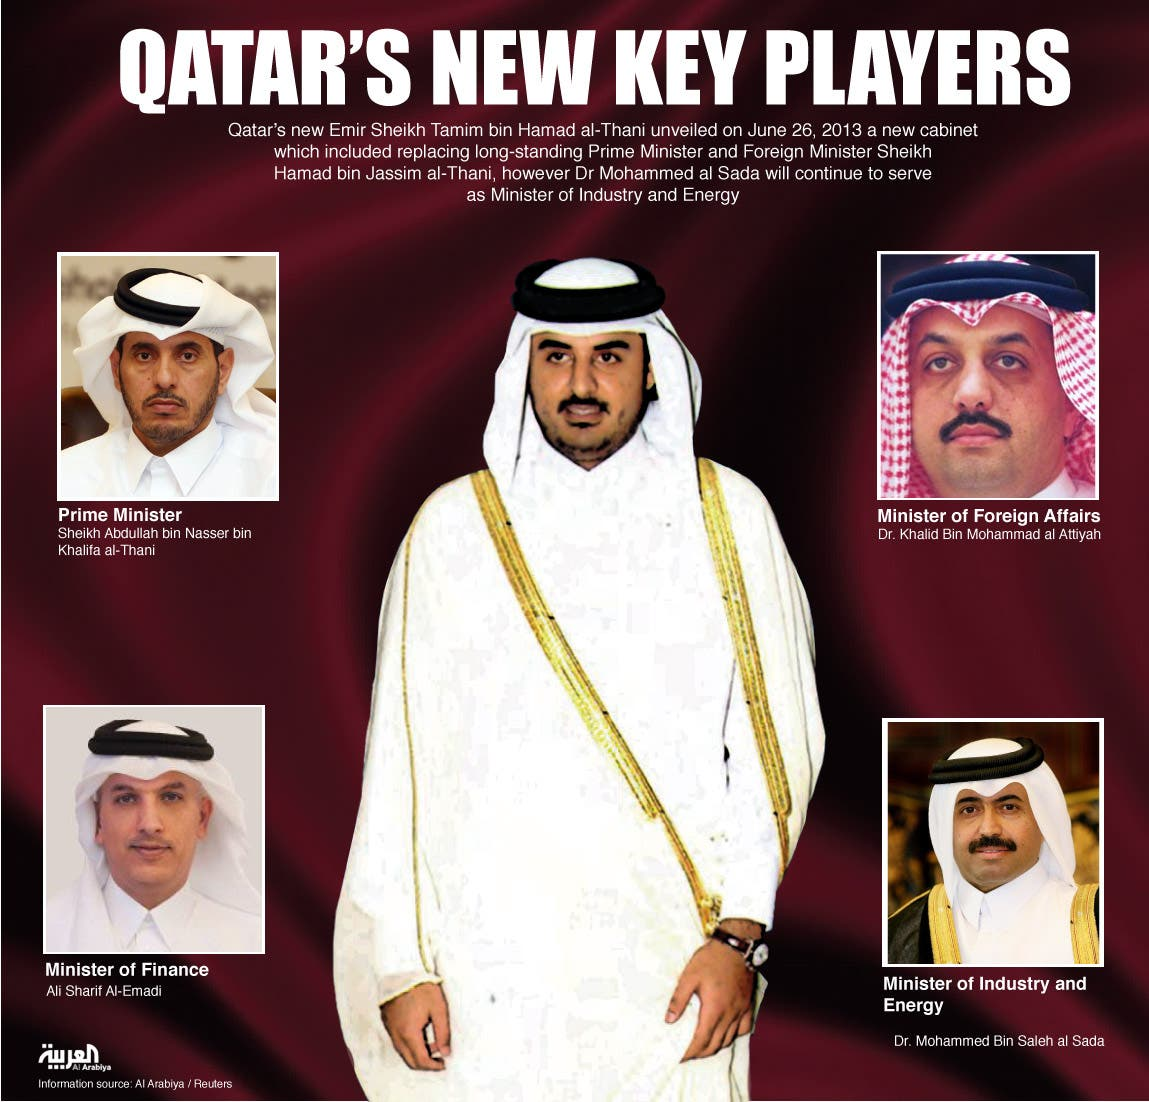 Infographic: Qatar's New key players (Design by Farwa Rizwan / Al Arabiya English)